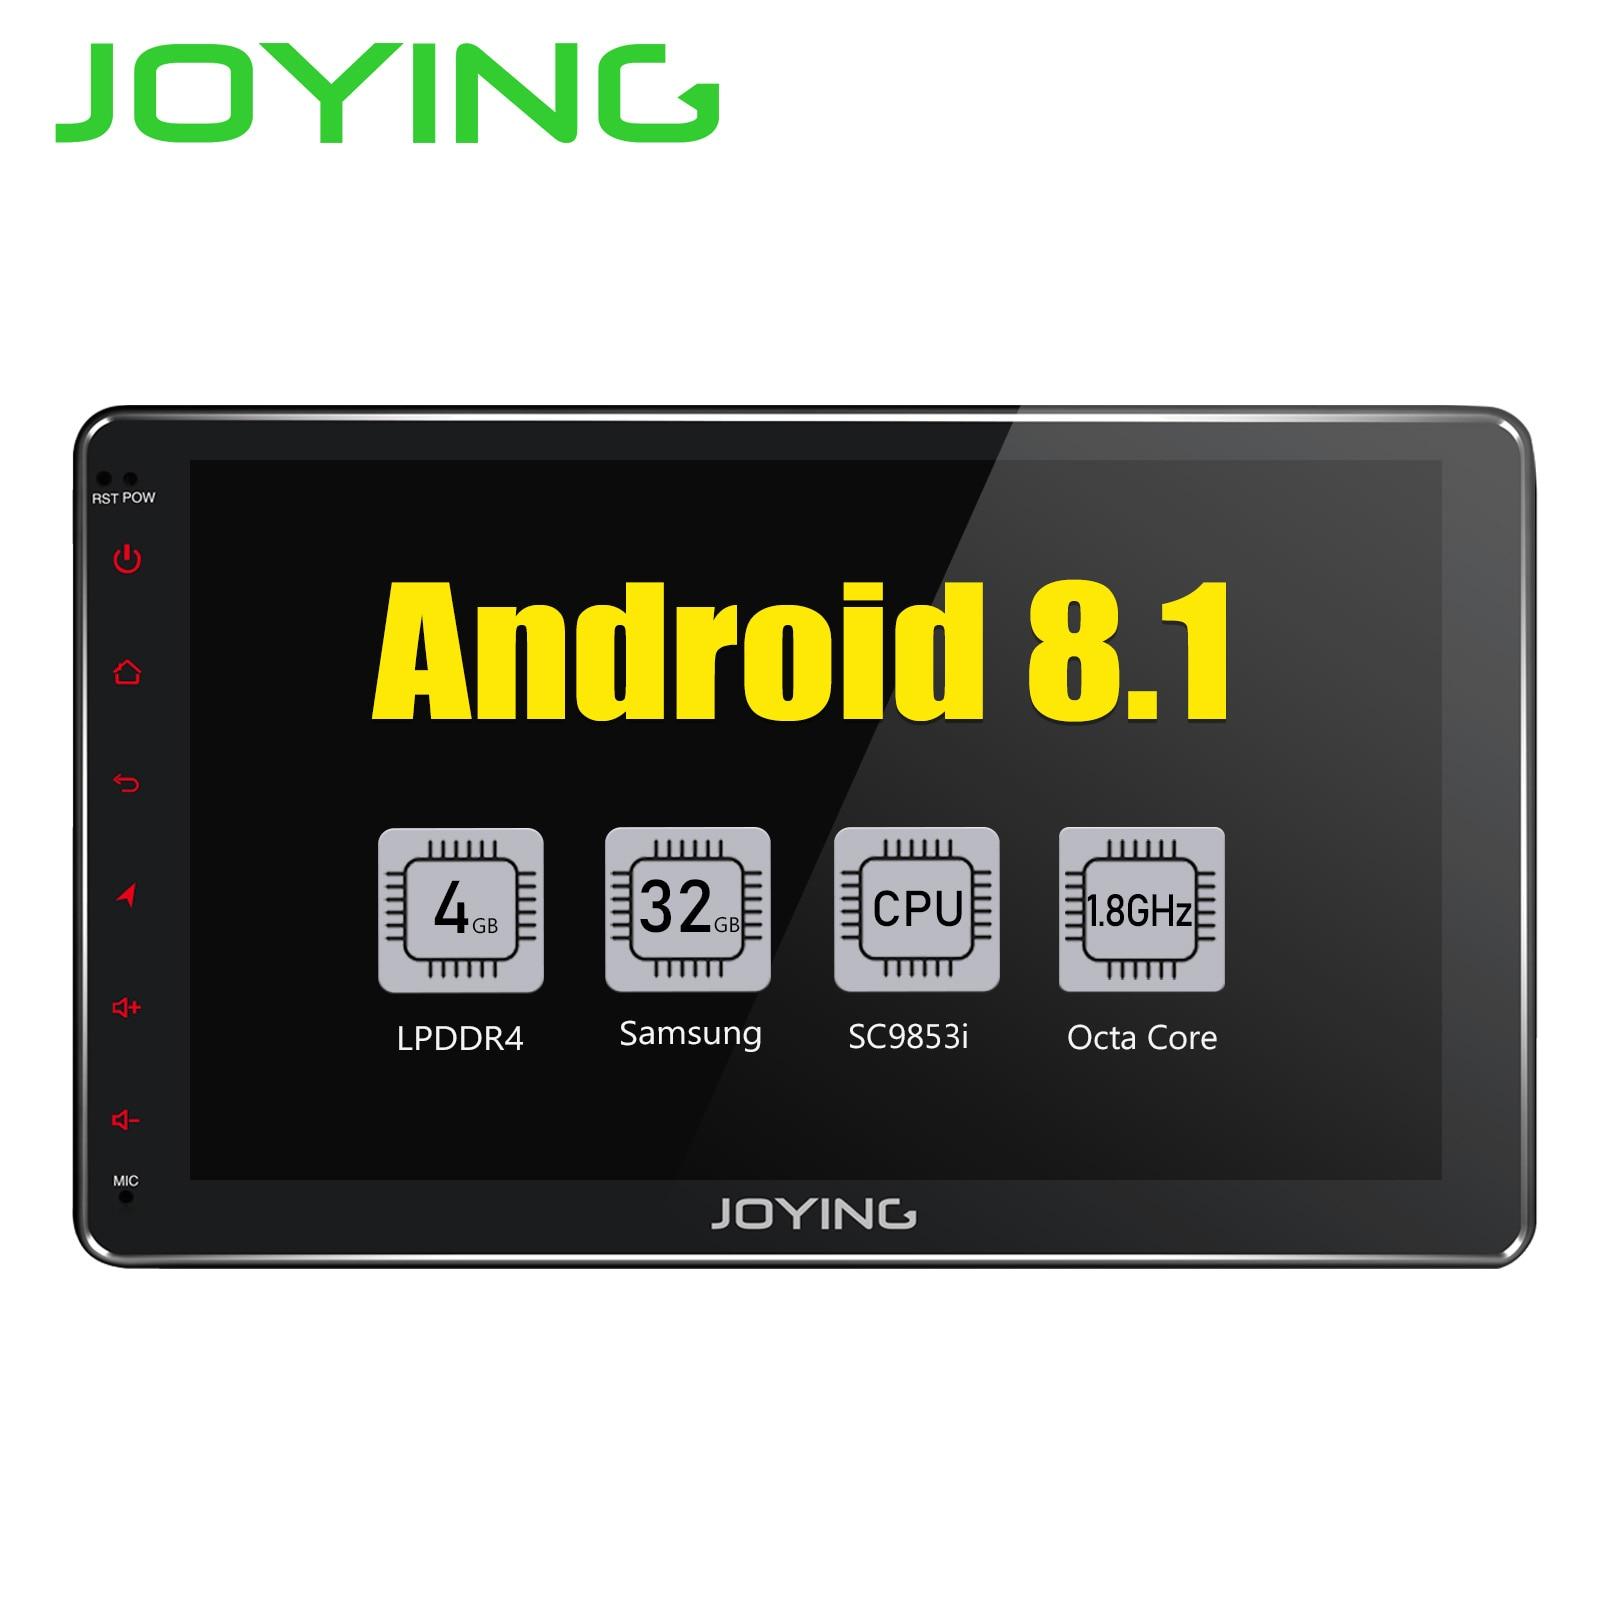 JOYING Android 8.1 2 din Autoradio Stereo Multimedia Player GPS Radio 10.1'' IPS HD Screen Head Unit with DSP Octa Core 4GB RAM